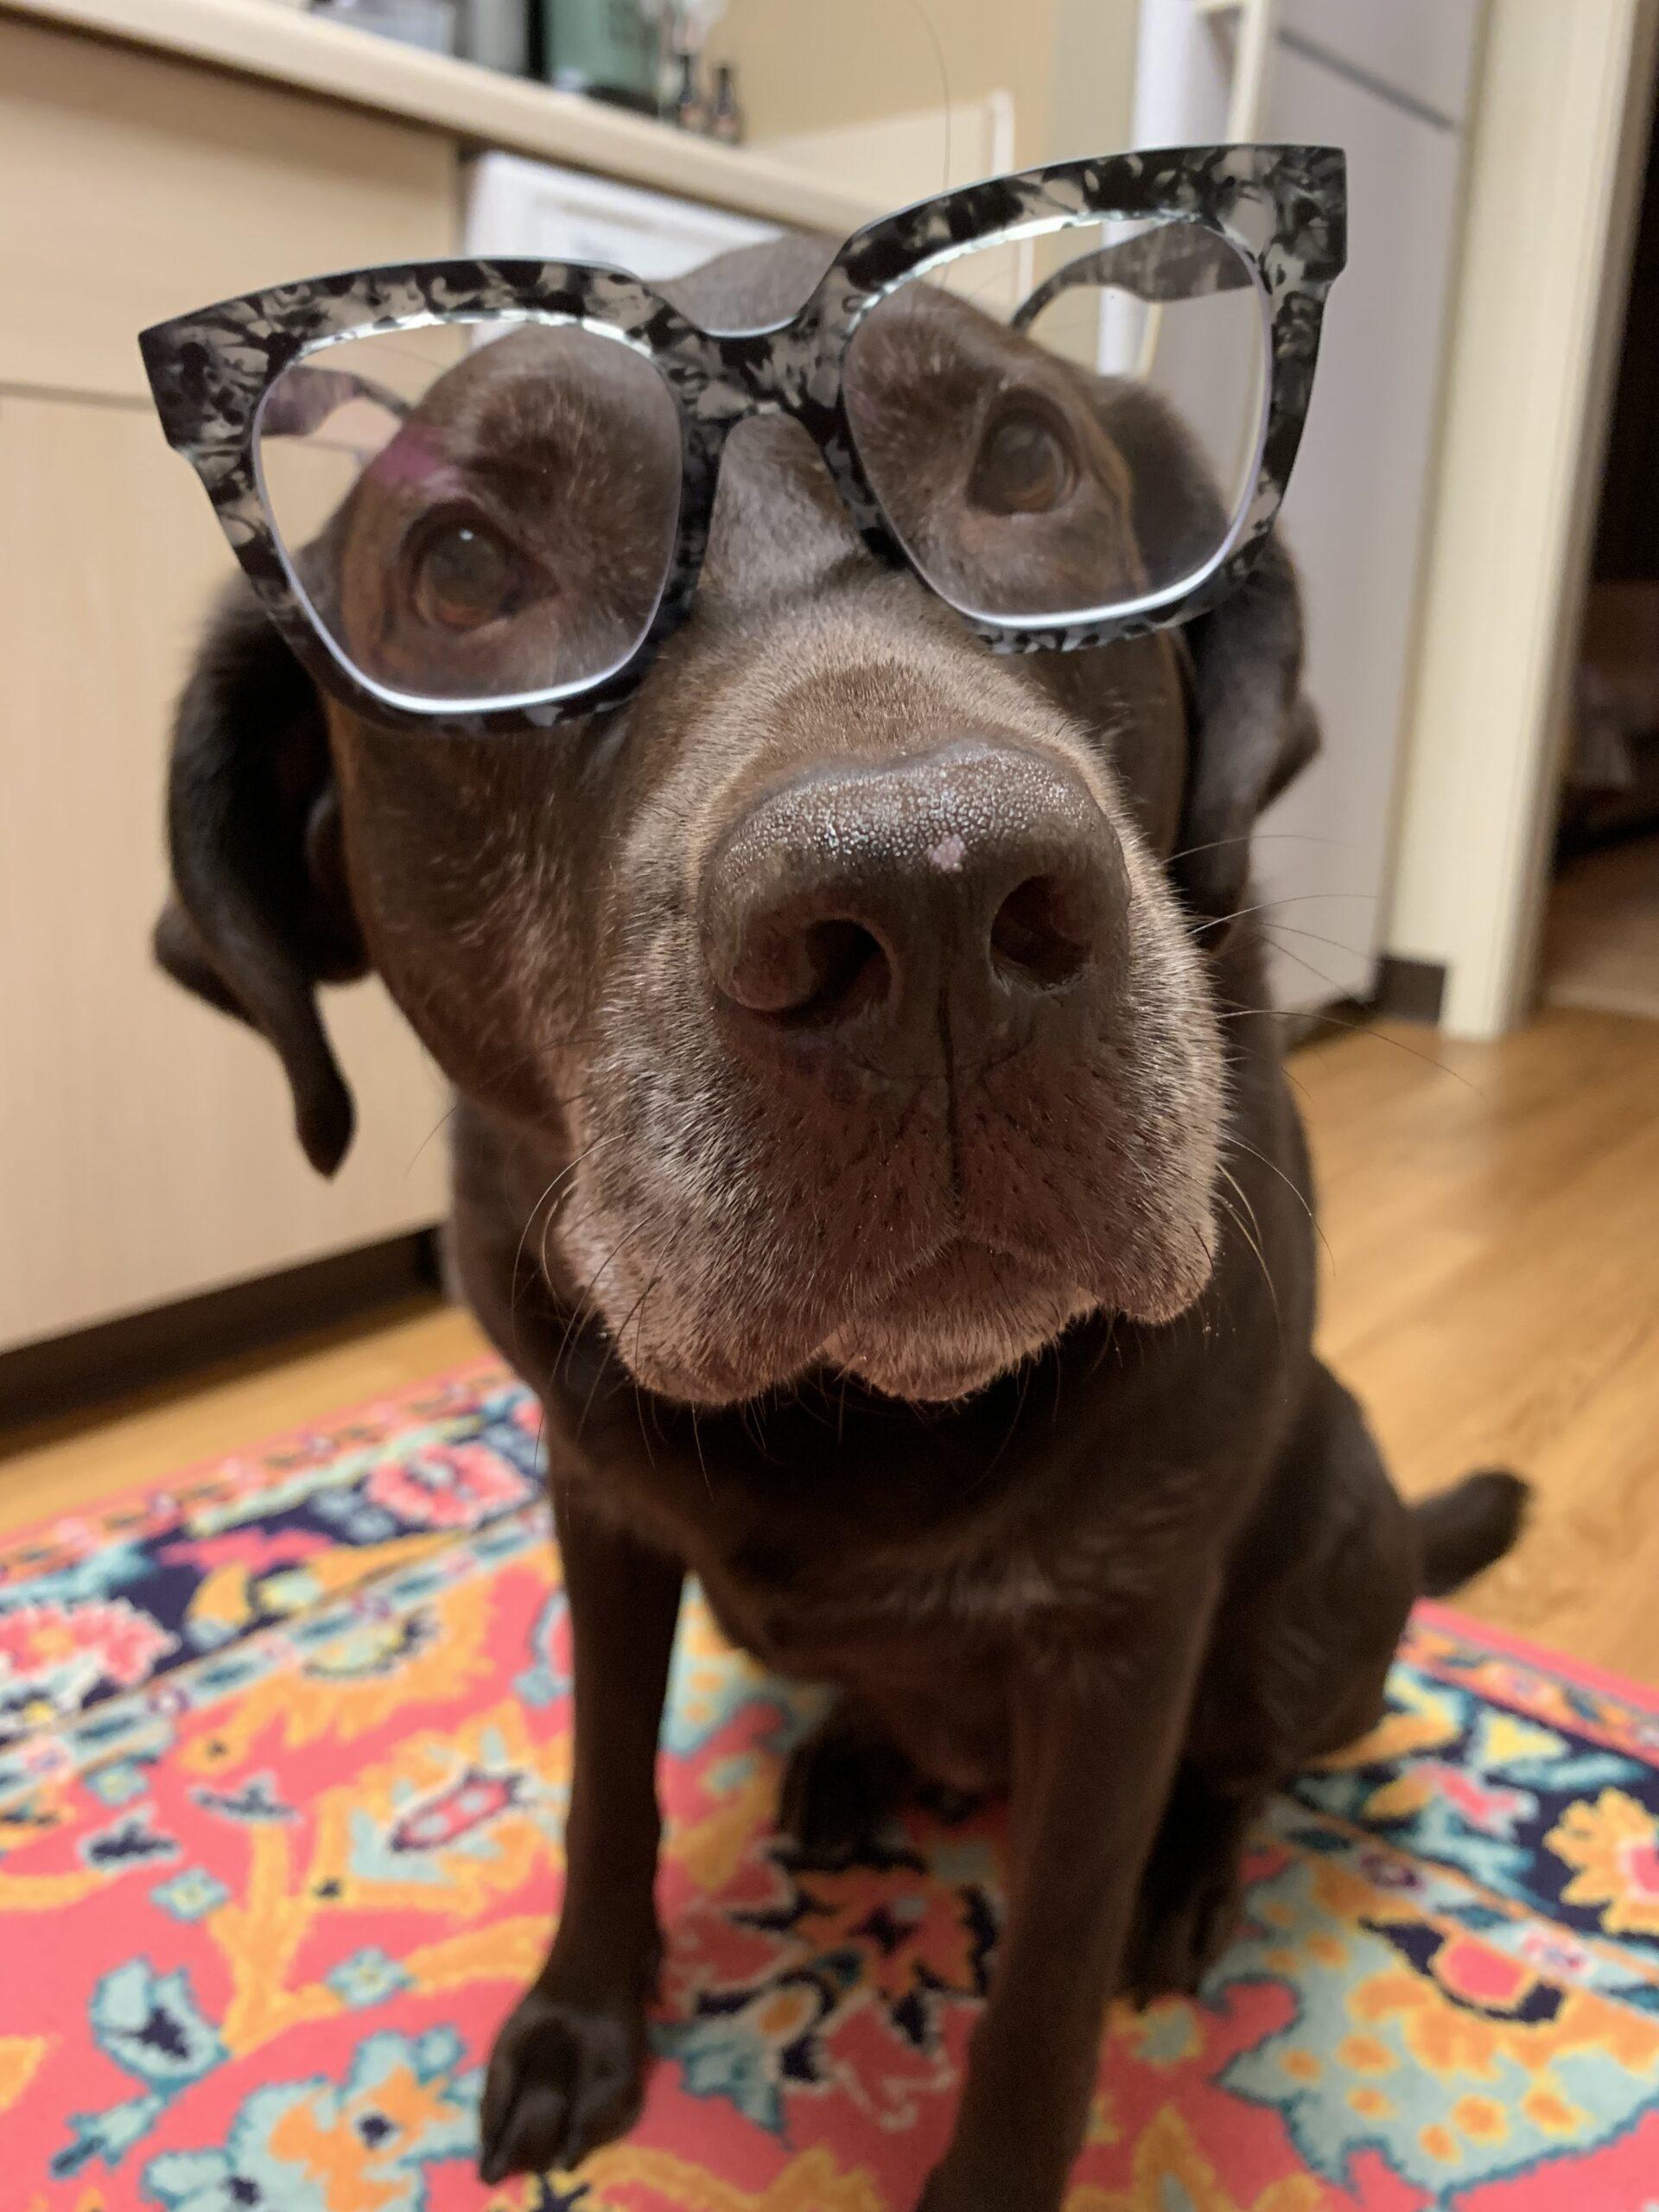 Chocolate Lab wearing glasses